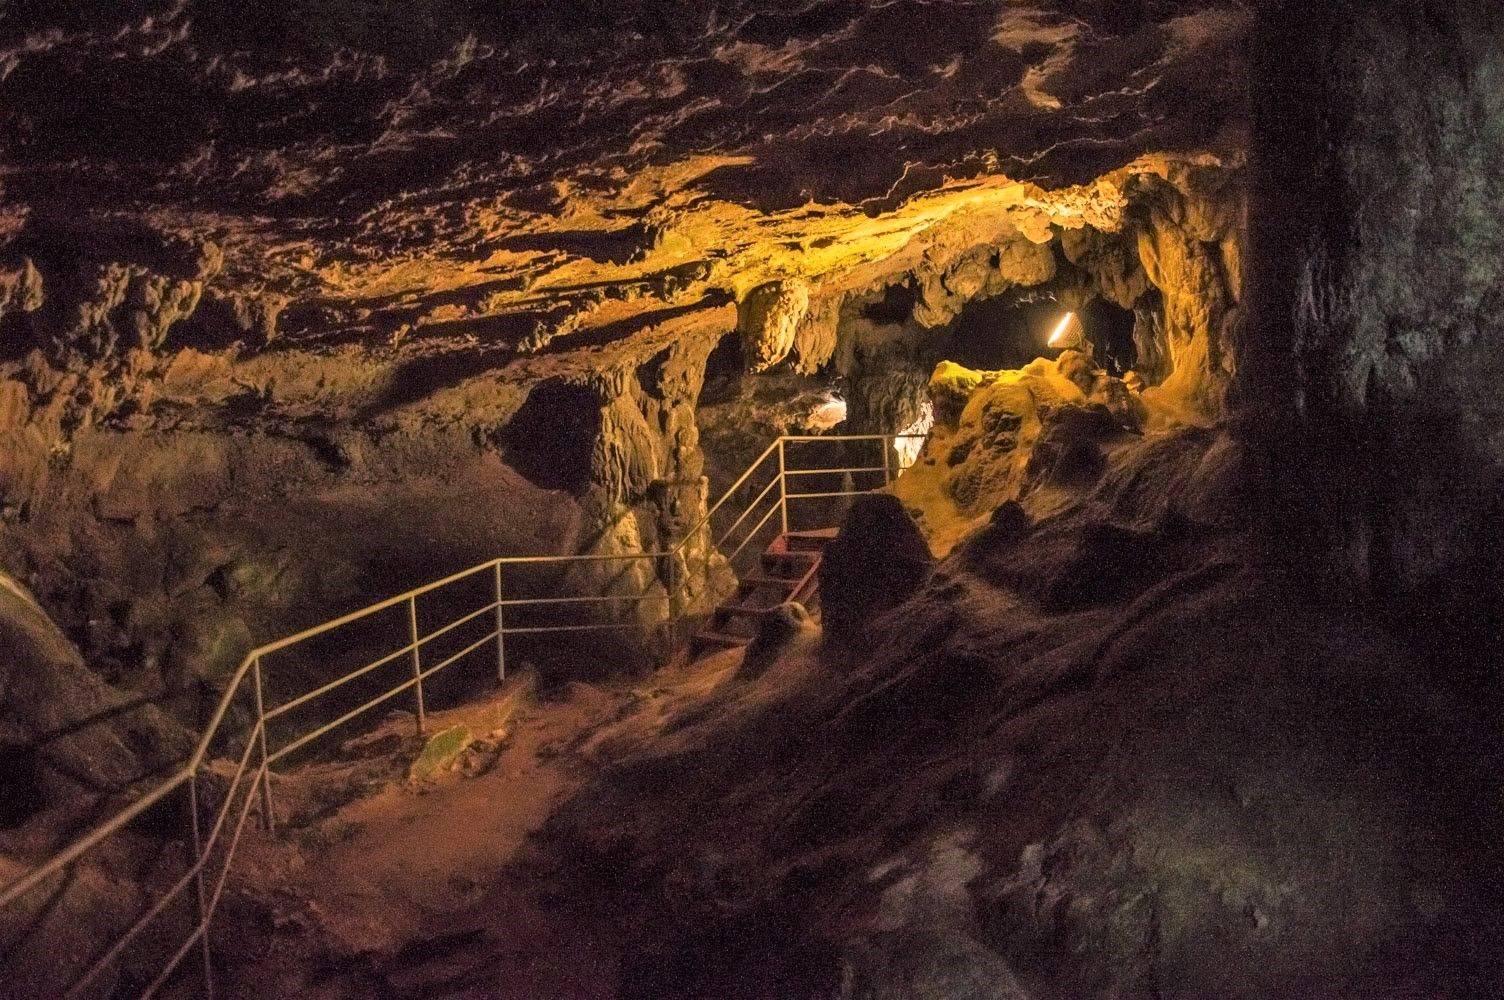 Пещера Ухловица е приказен подземен дворец